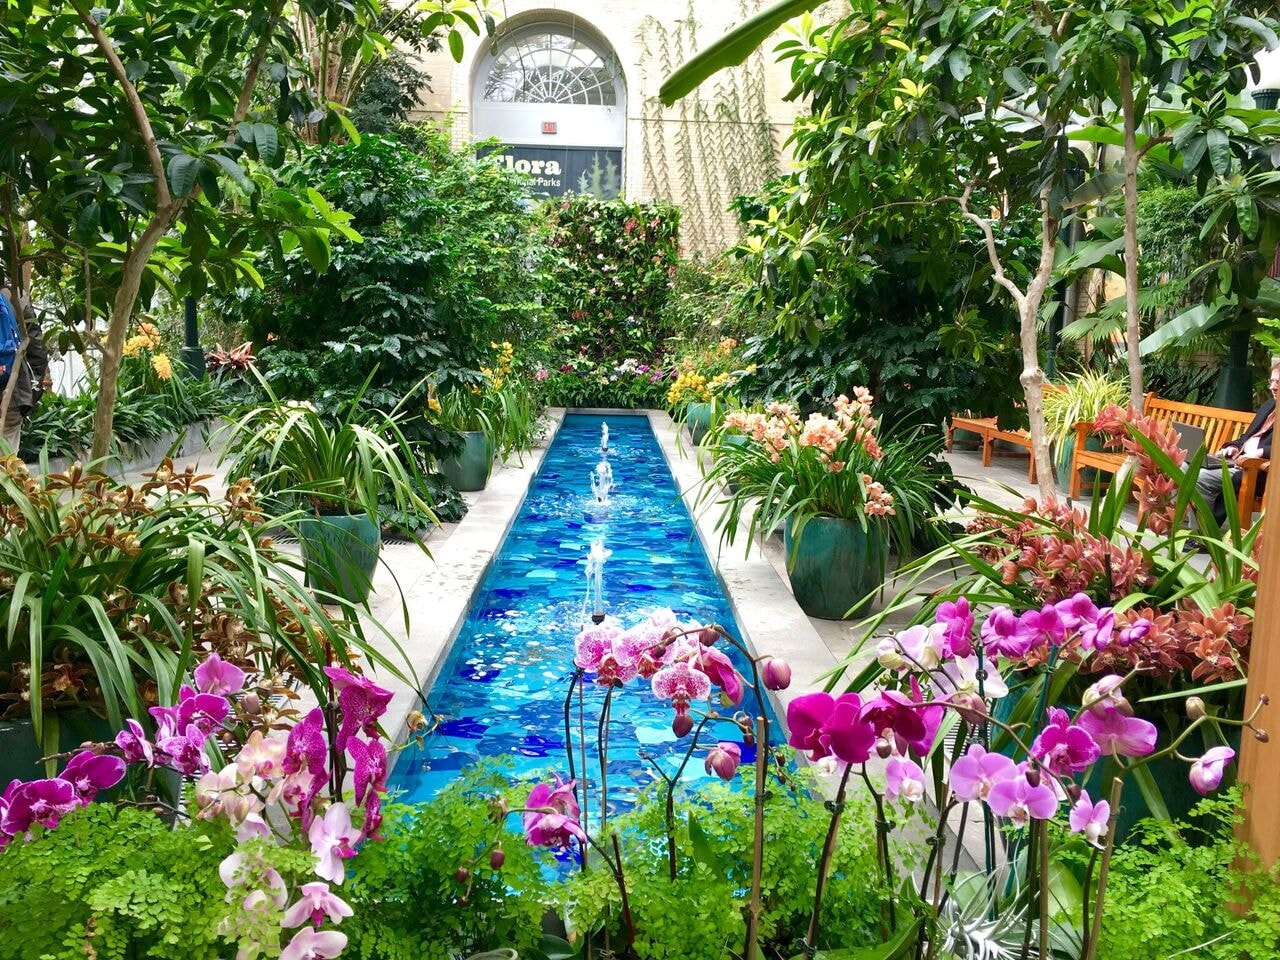 Courtesy Of U.S. Botanic Garden